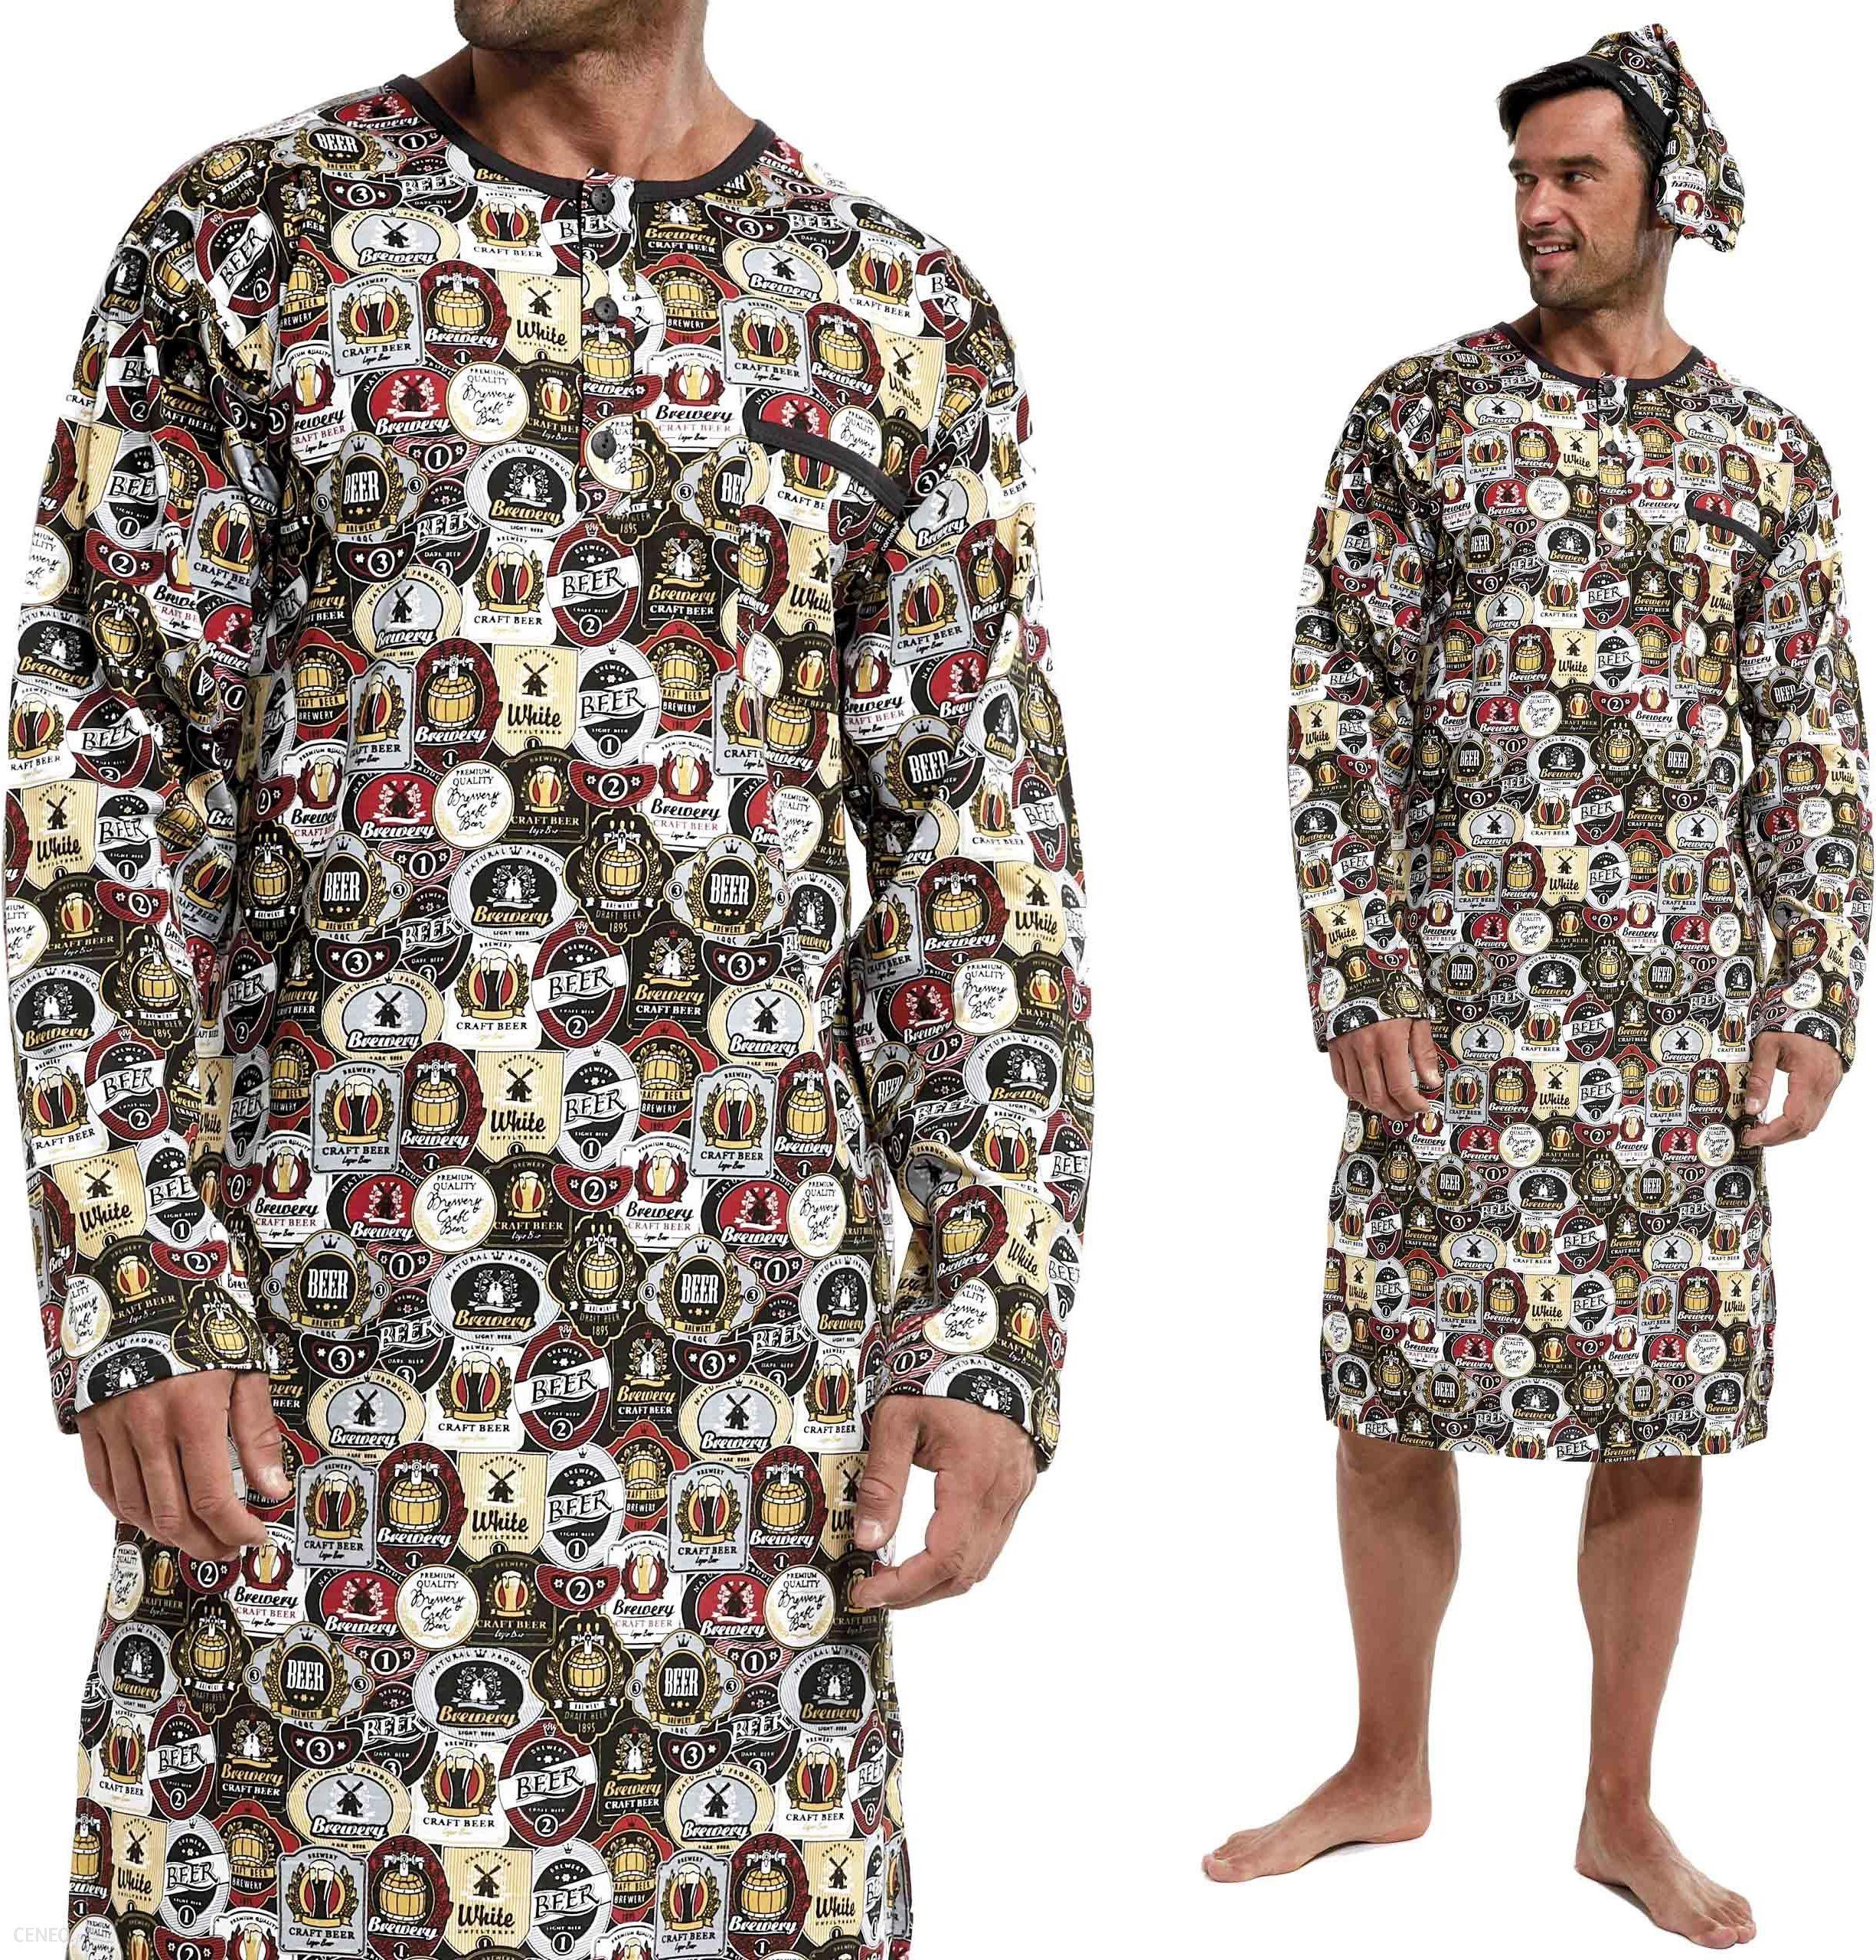 643301 110 Cornette koszula męska nocna szlafmyca  rjVYm